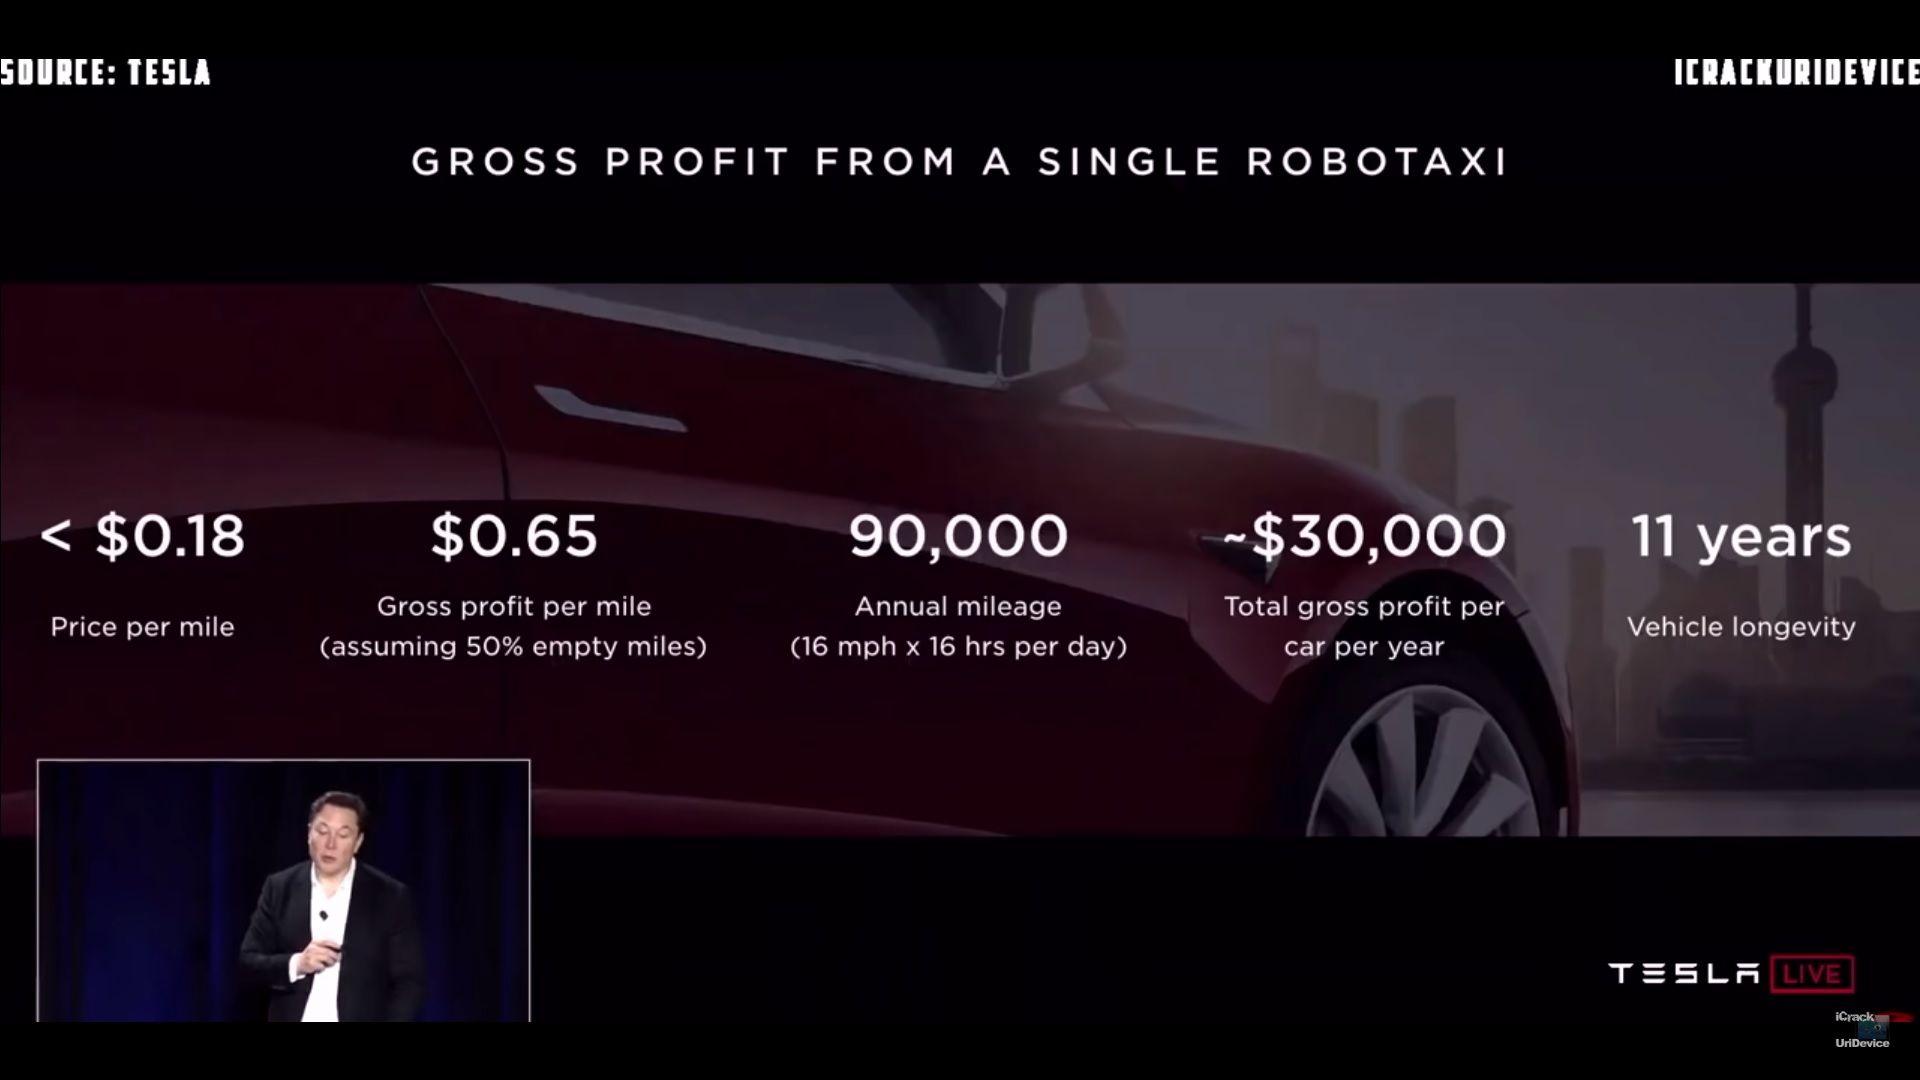 Ride Hailing Lidar Life Span And Self Driving Tech Tesla Has It All Figured Out Top Speed Self Driving Tesla Tesla Model X